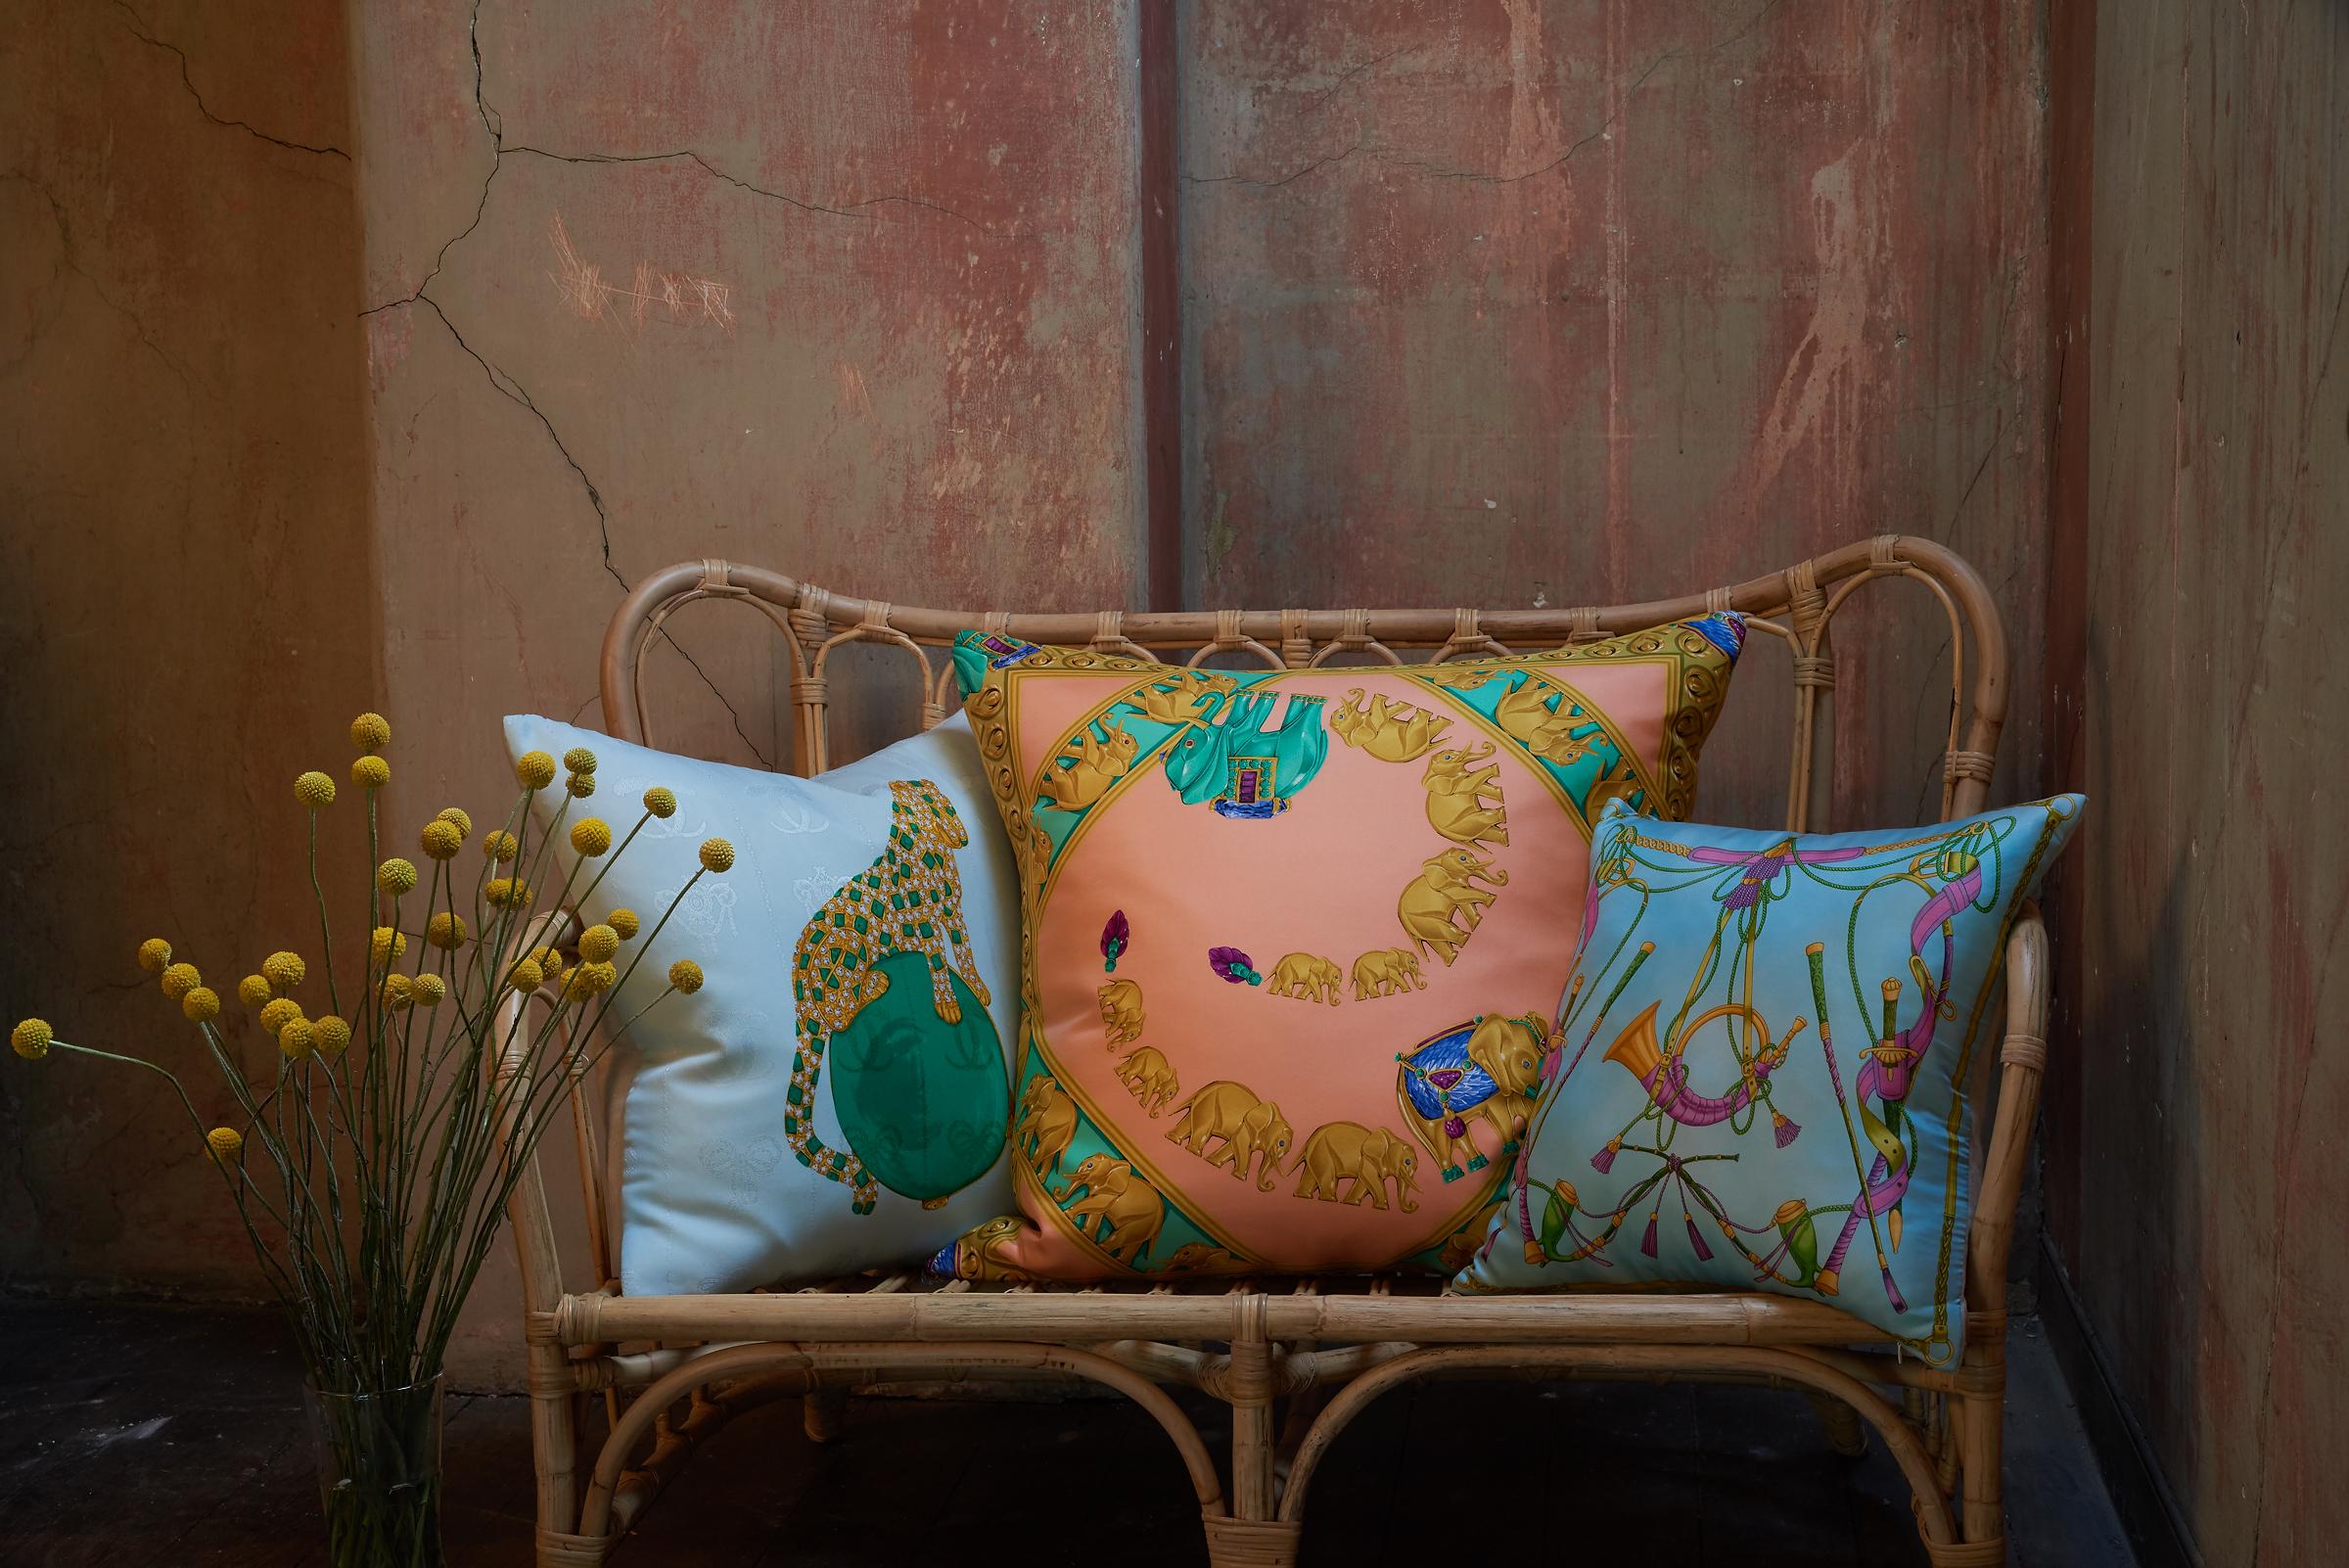 Belfast designer Katie Larmour's Luxury Handcrafted Vintage Silk Scarf and Irish Linen Cushions Pillows, 2014, Brown Thomas Dublin Ireland 4.JPG